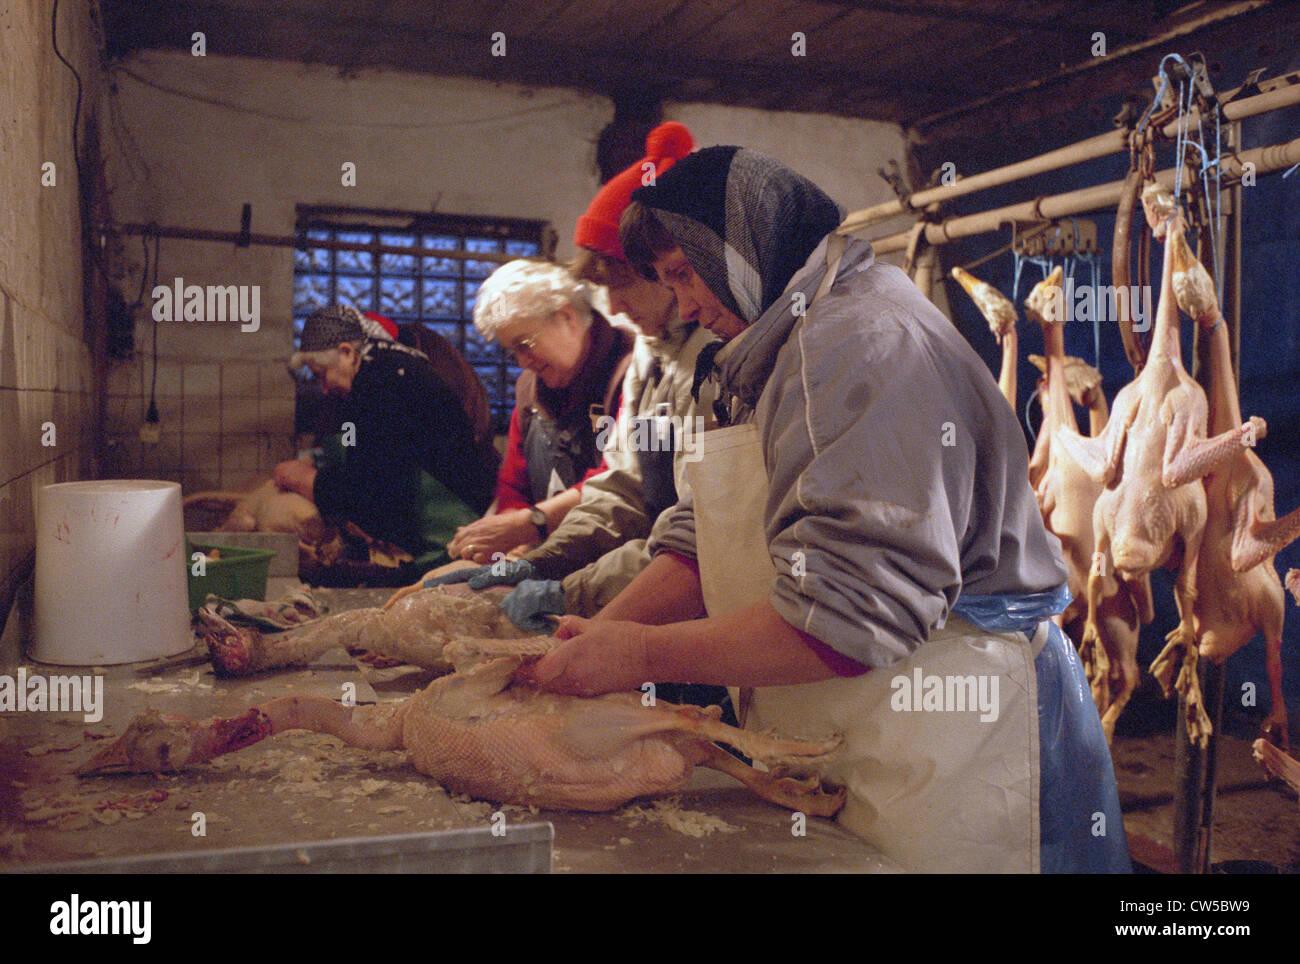 Weihnachtsgaense be exempted, Lower Saxony - Stock Image